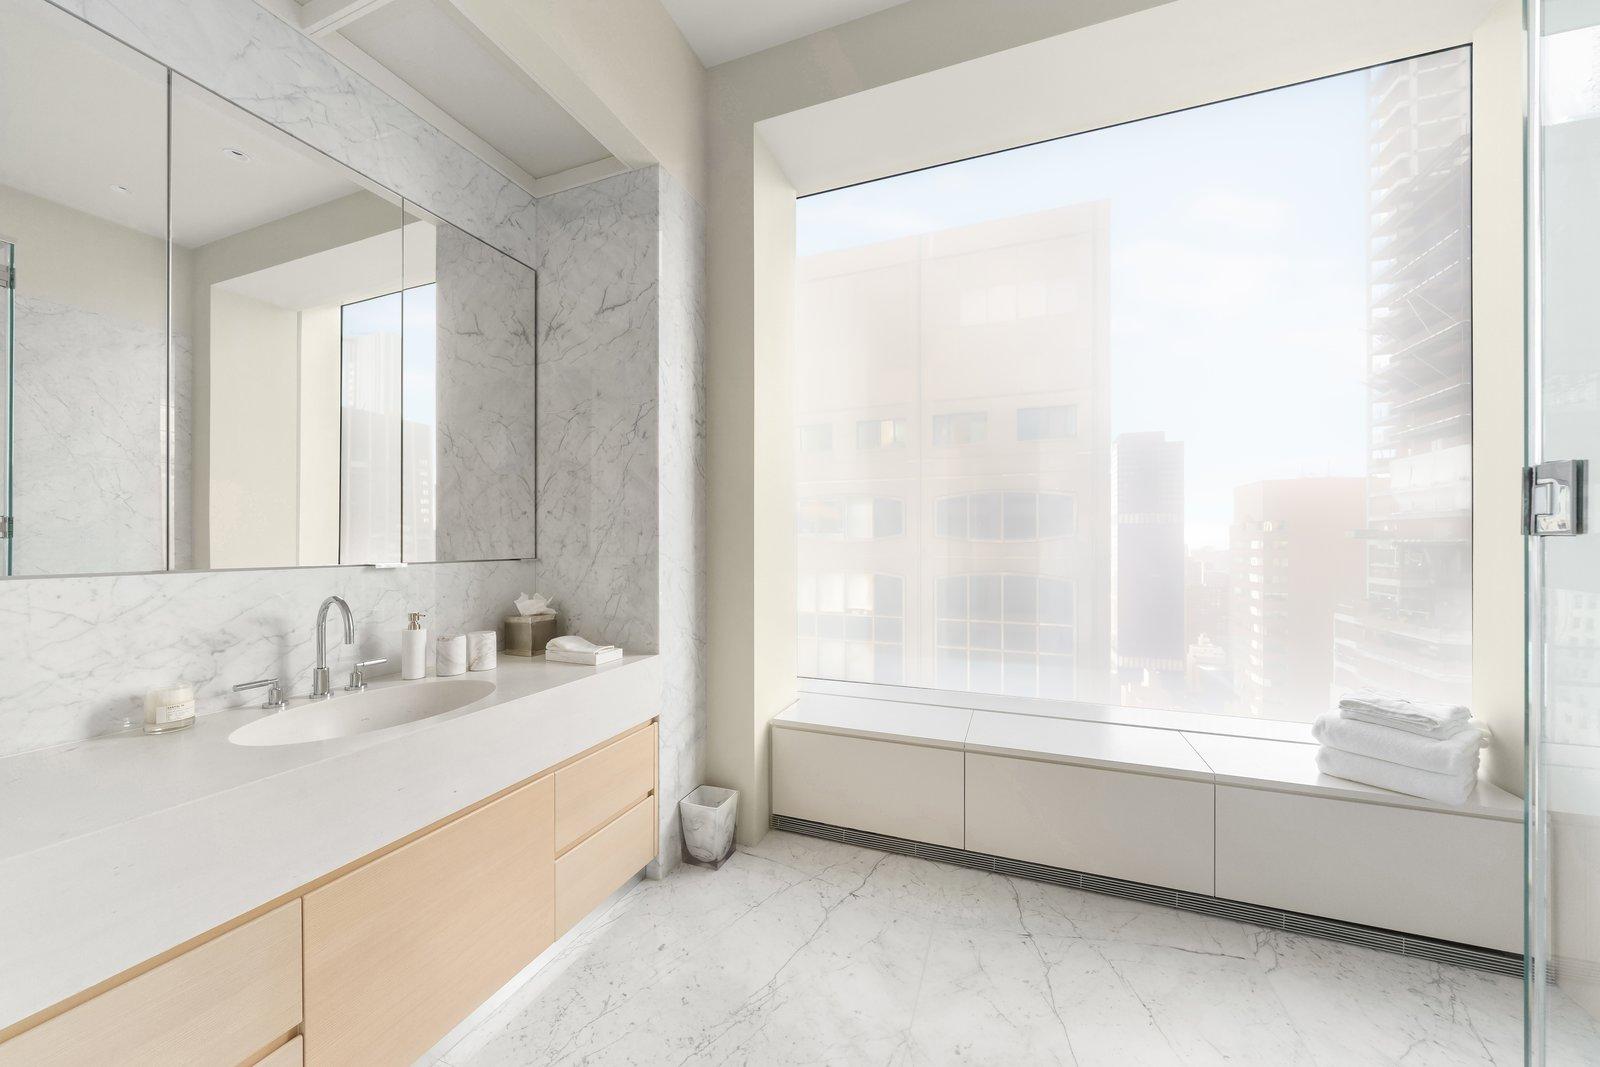 J.Lo and A-Rod's 432 Park Avenue apartment bathroom